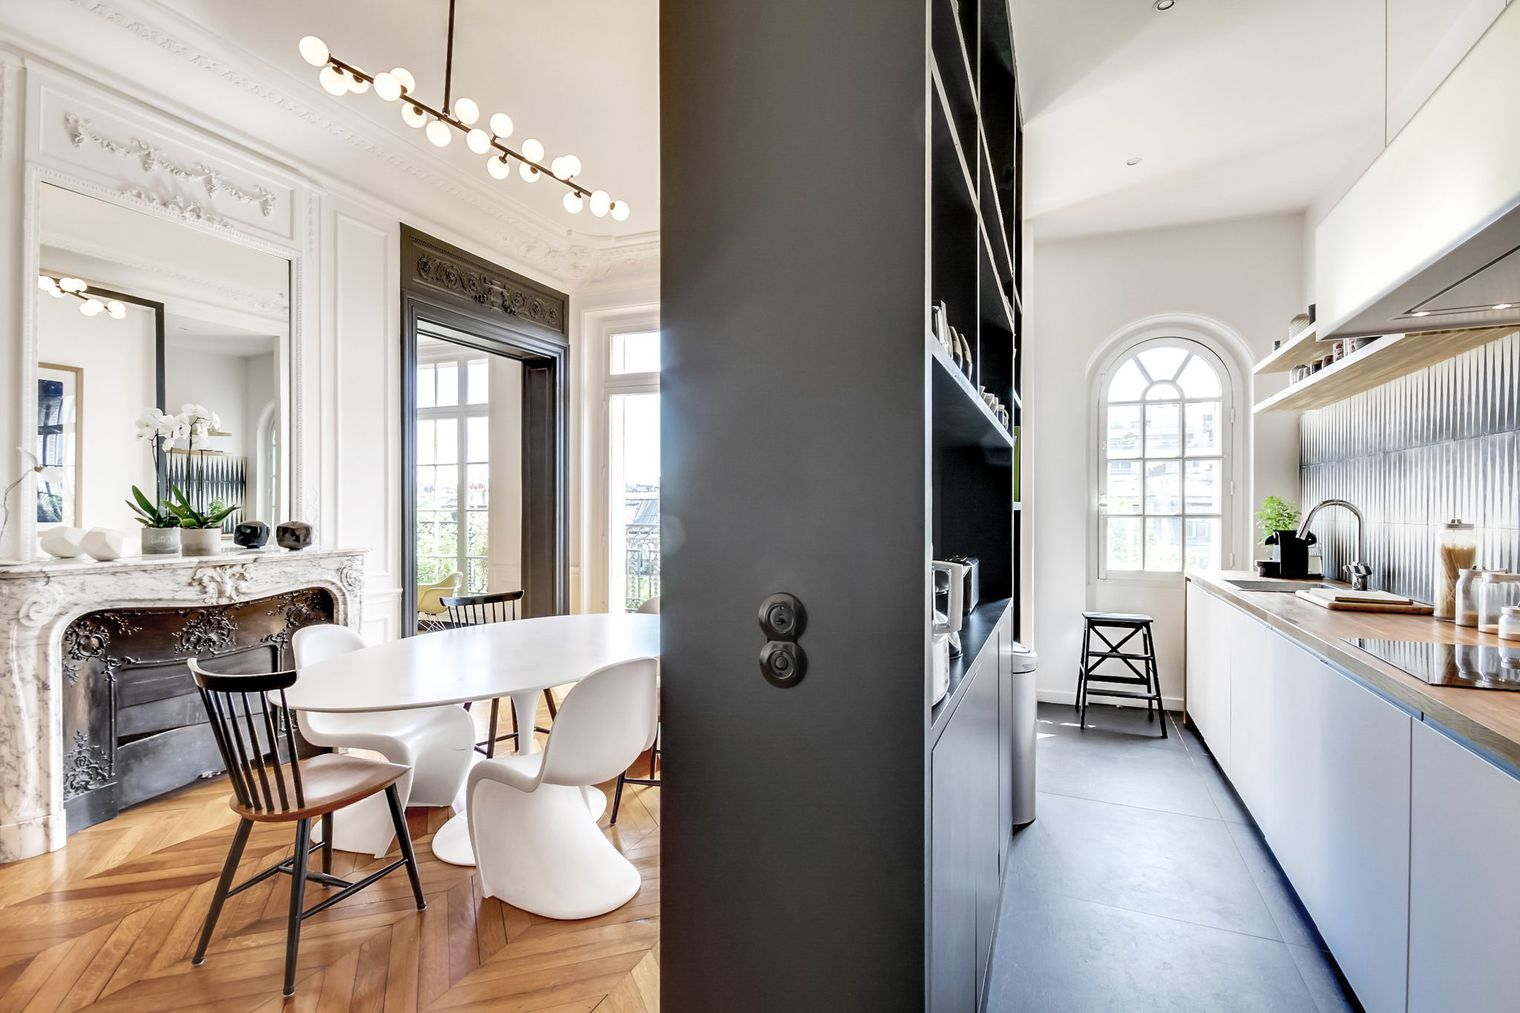 mon mari s int resse location appartement clermont ferrand. Black Bedroom Furniture Sets. Home Design Ideas